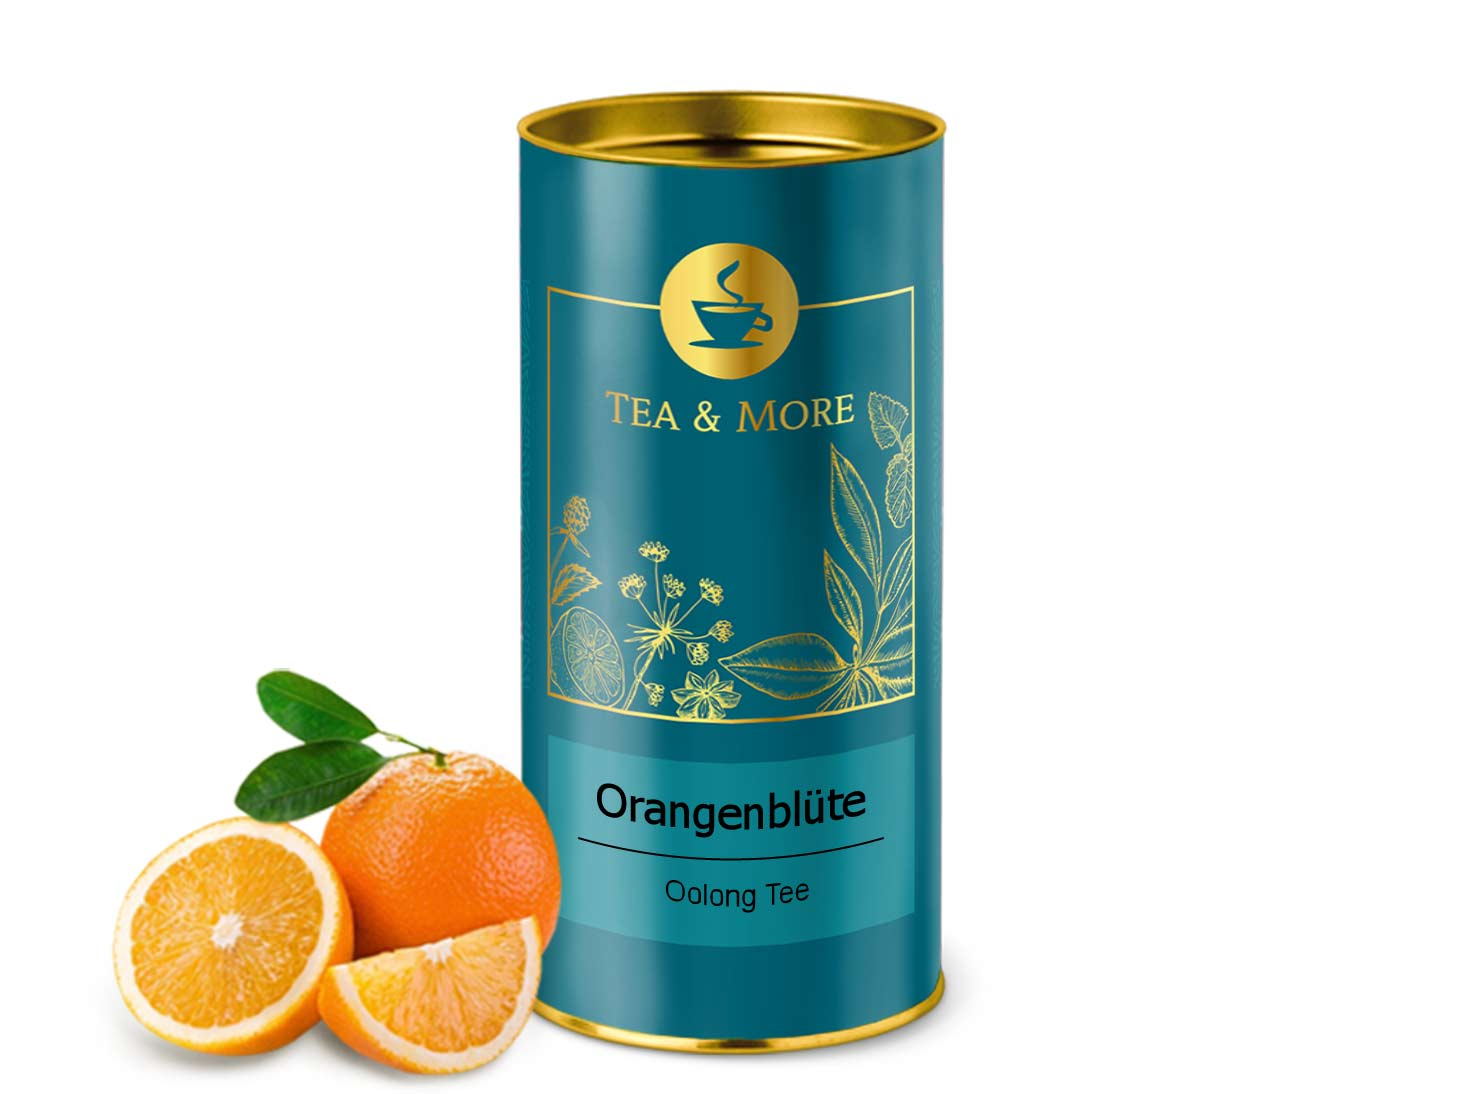 Oolong Orangenblüte